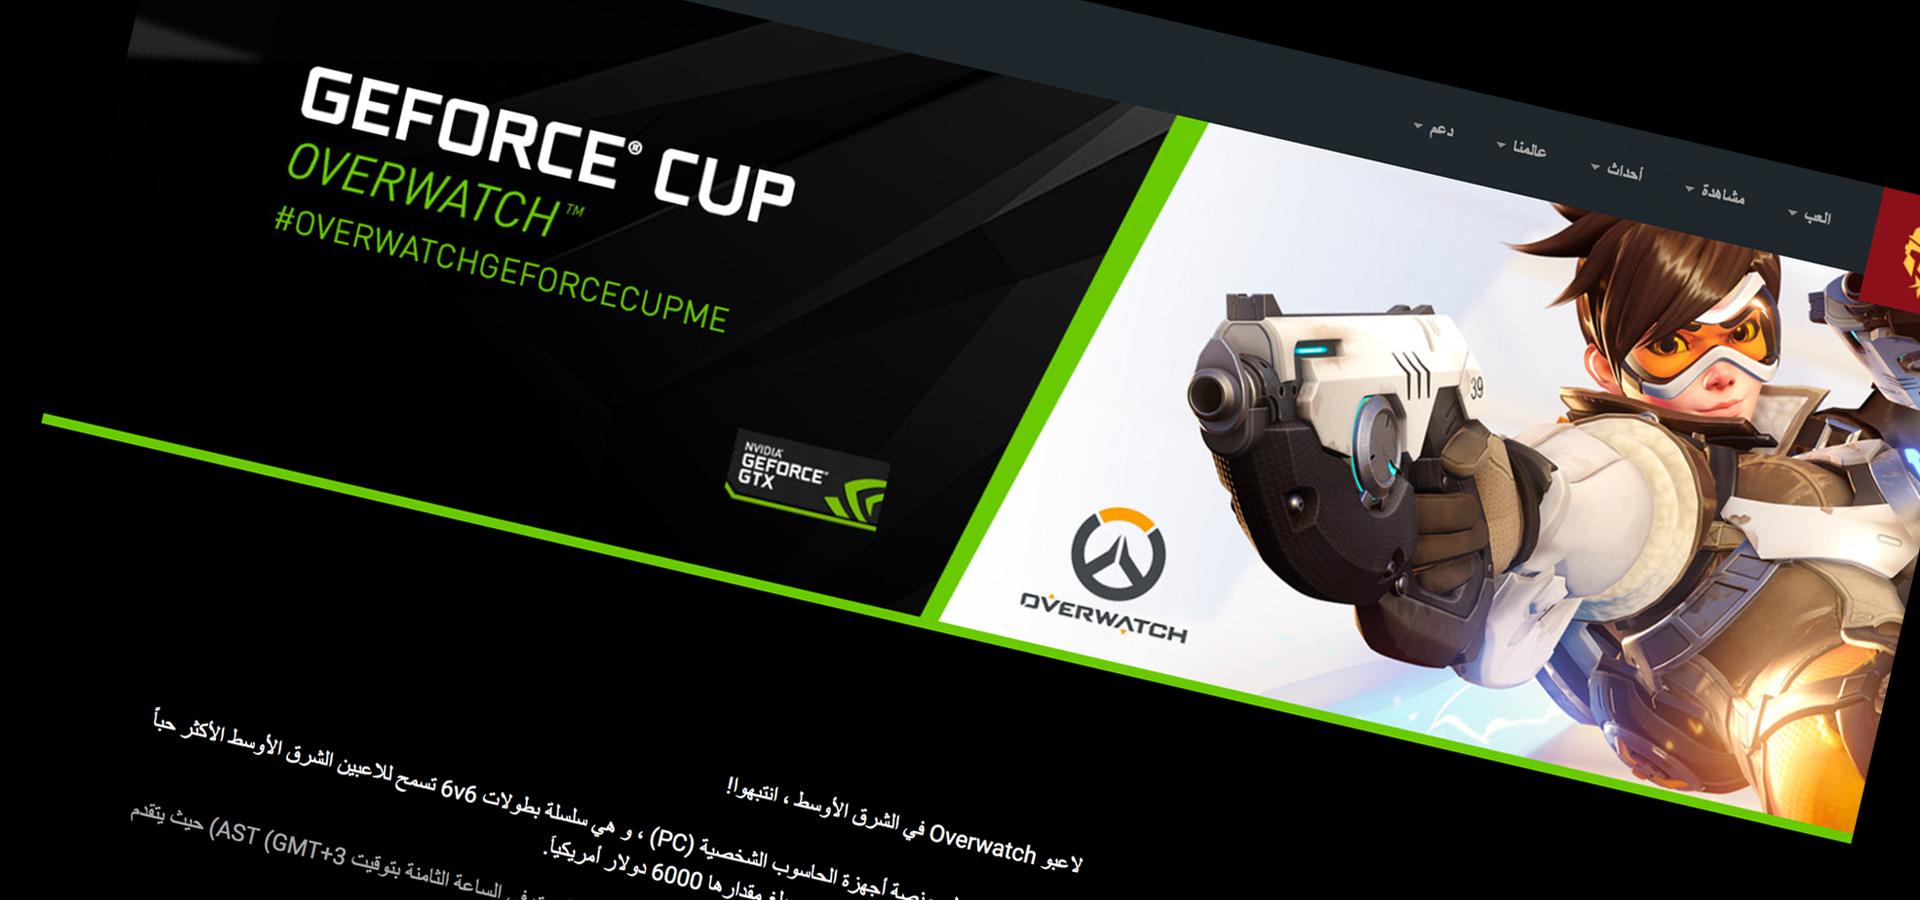 MEGL GeForce Cup Overwatch